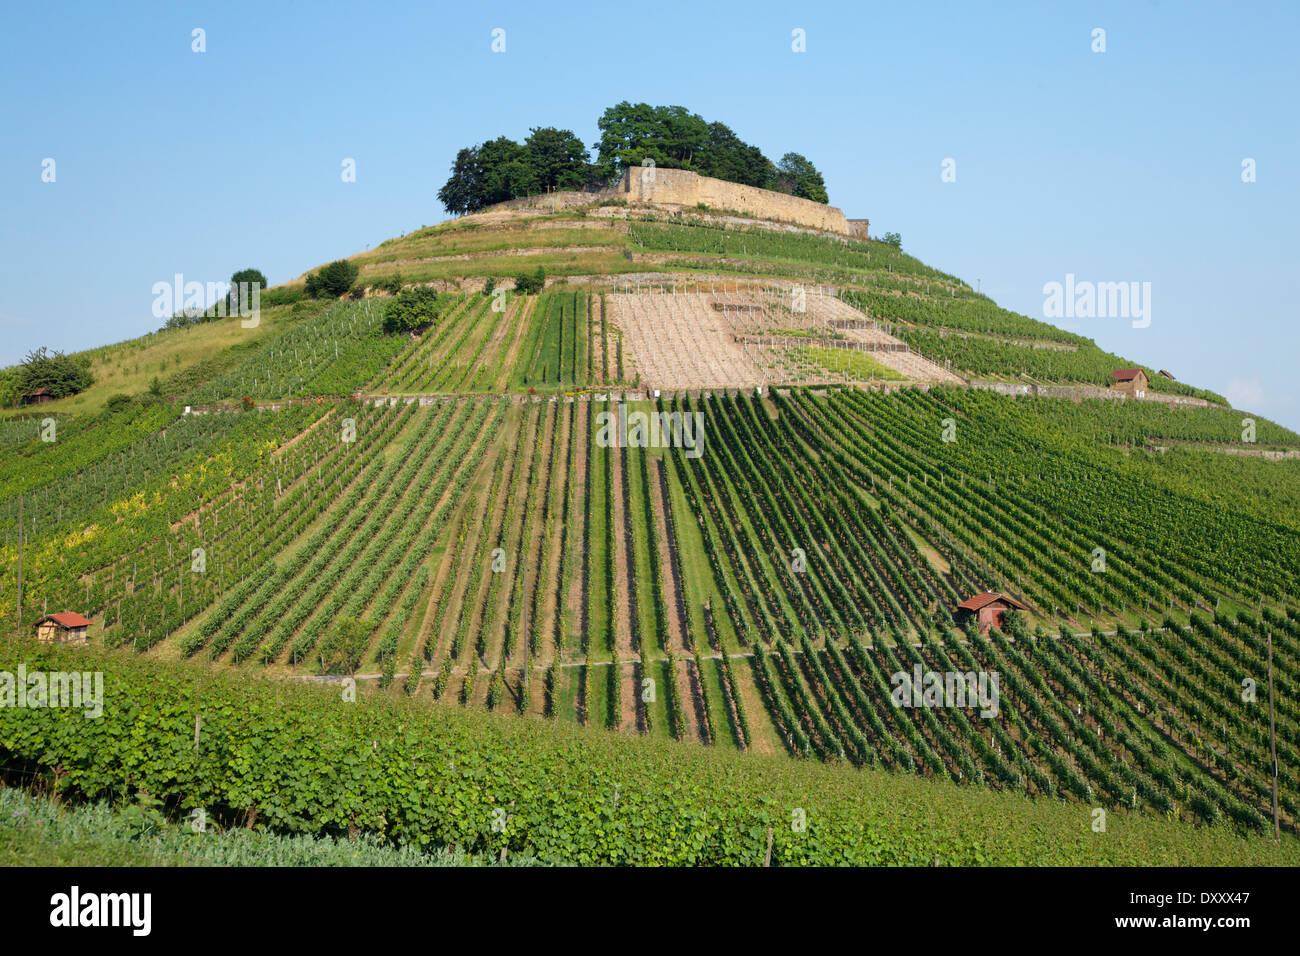 "Deutschland, Weinberg, Burg Ruinen ""Weibertreu"", Deutschland, Baden-Württemberg, Weinsberg, Burgruine ""Weibertreu"" Stockbild"